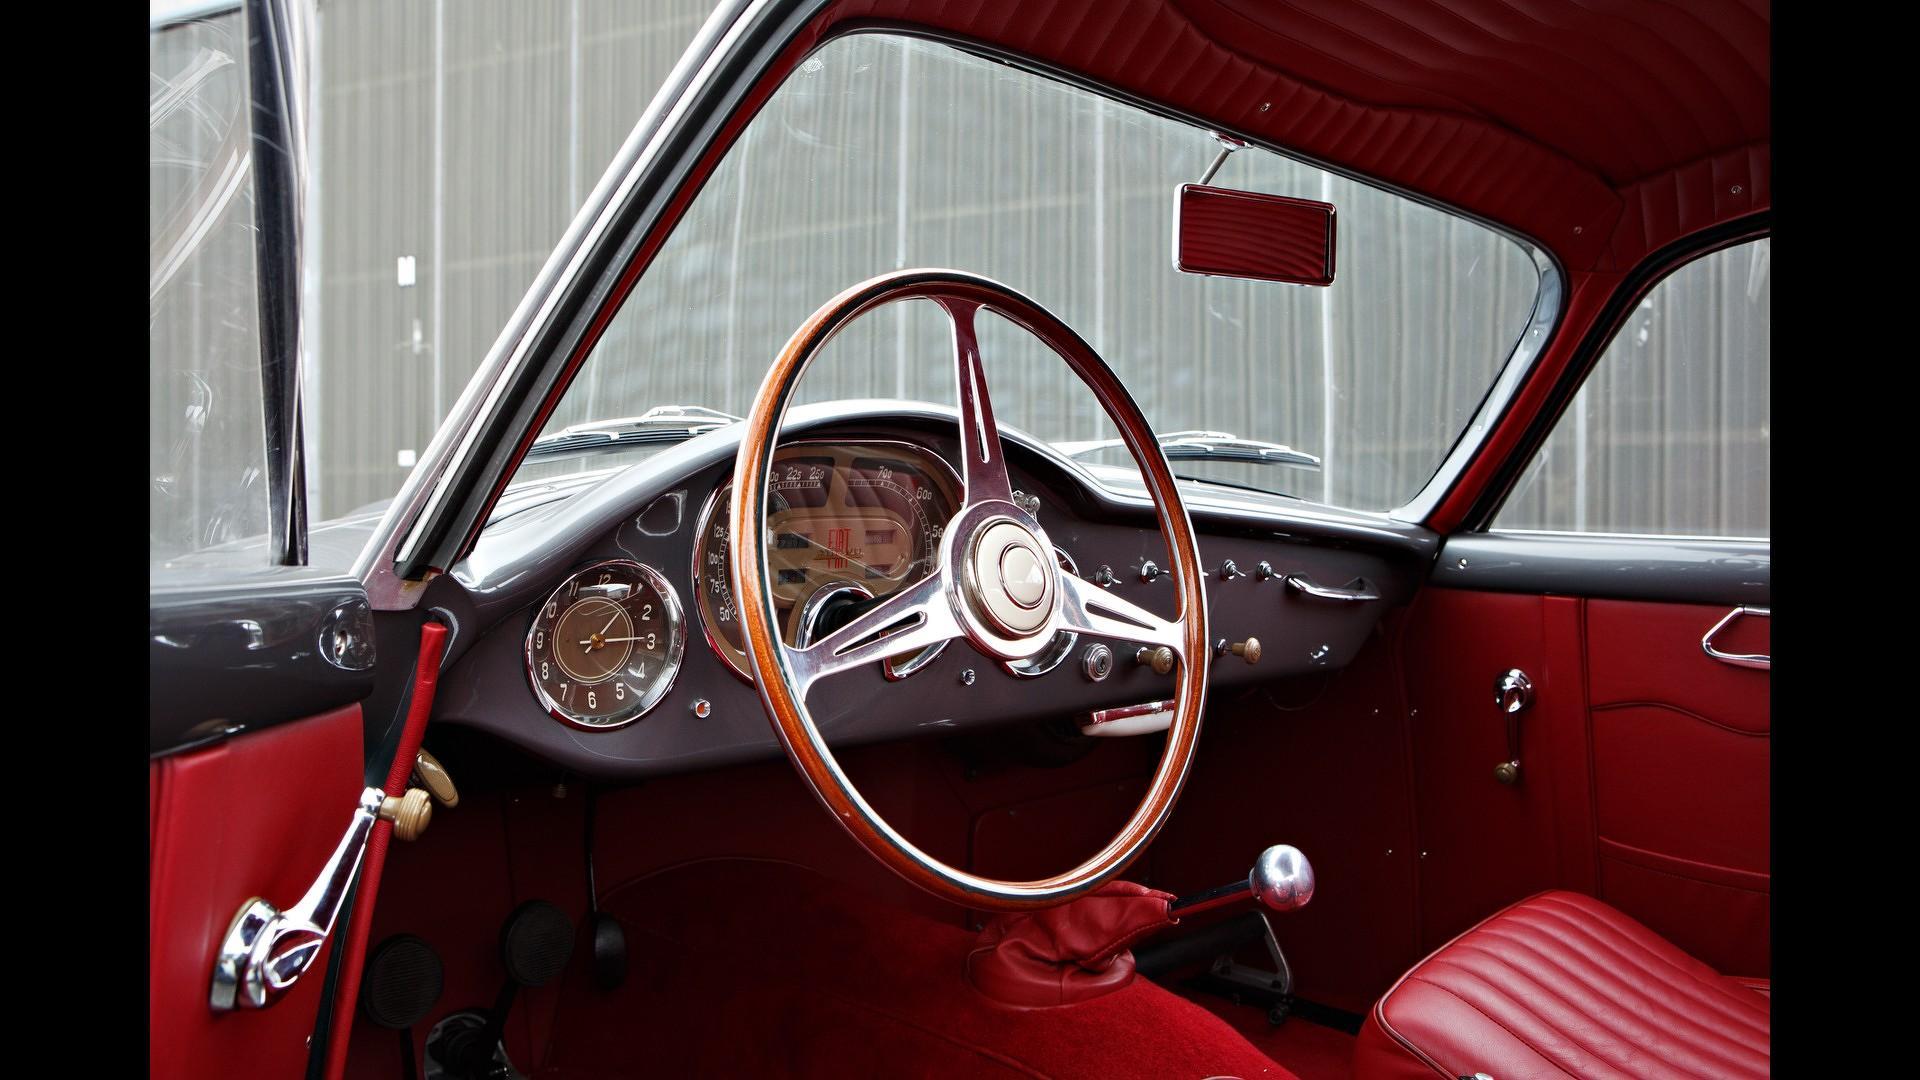 1953-fiat-8v-berlinetta-elaborata-copyright-gooding-company-brian-henniker (3)